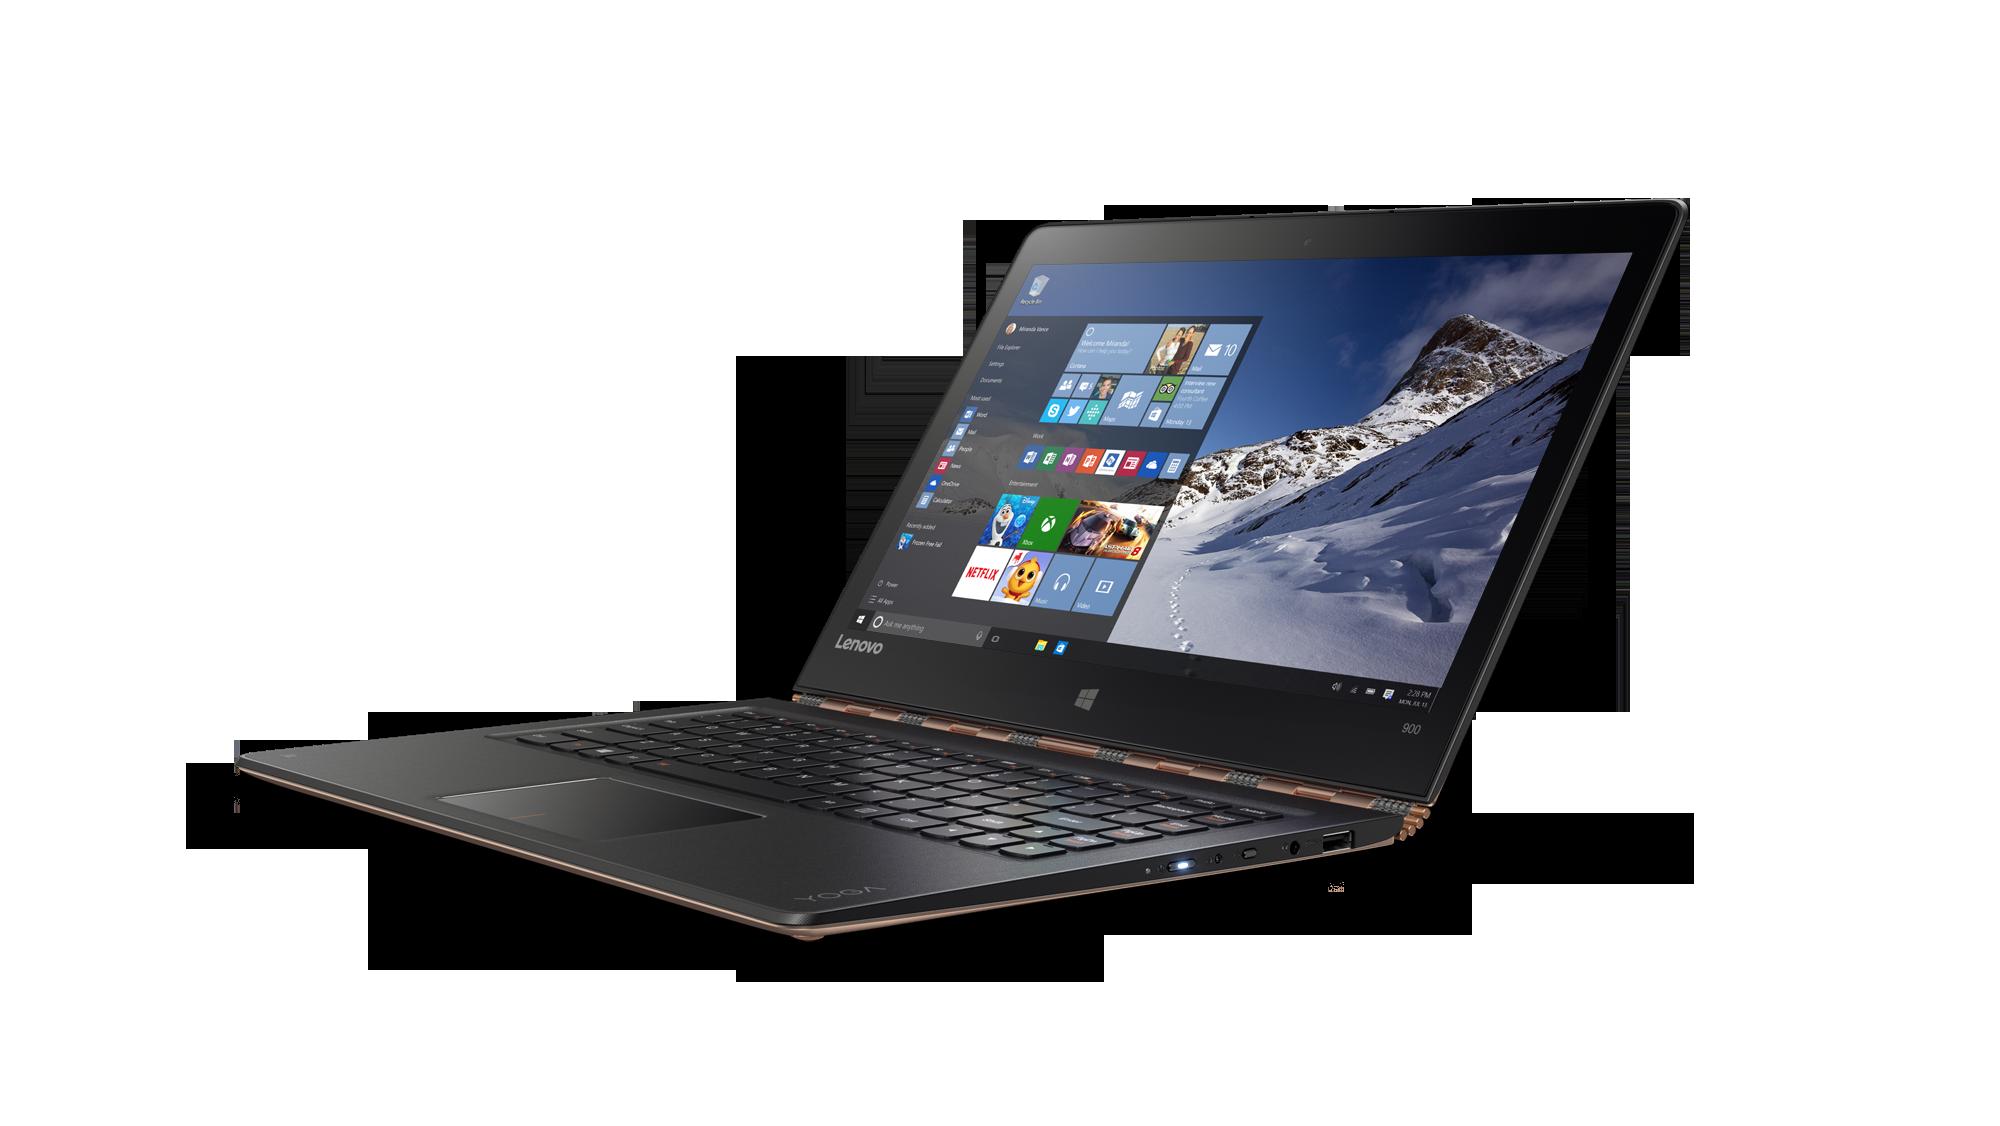 "Lenovo Yoga 900 13,3""QHD+/i7-6500U/512/8G/Win 10 zlatý"